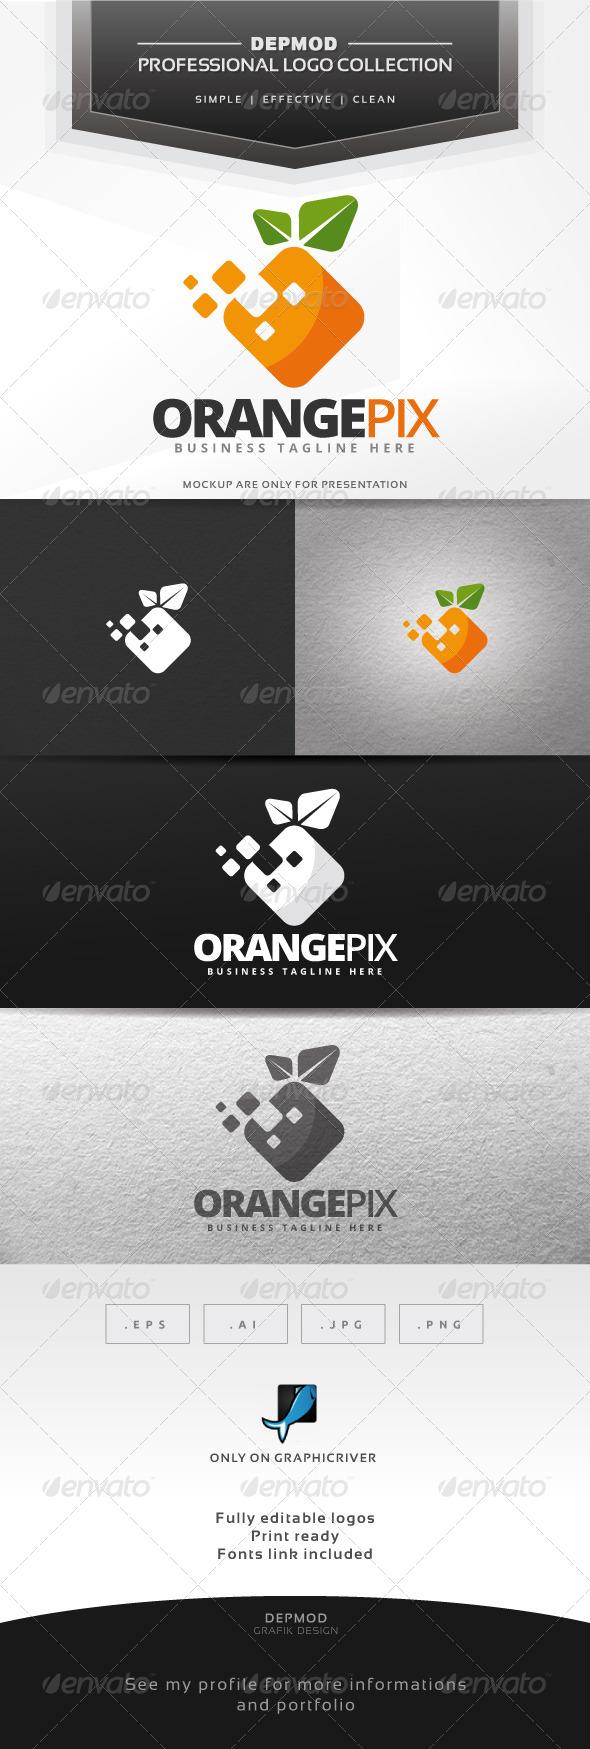 Orange Pix Logo